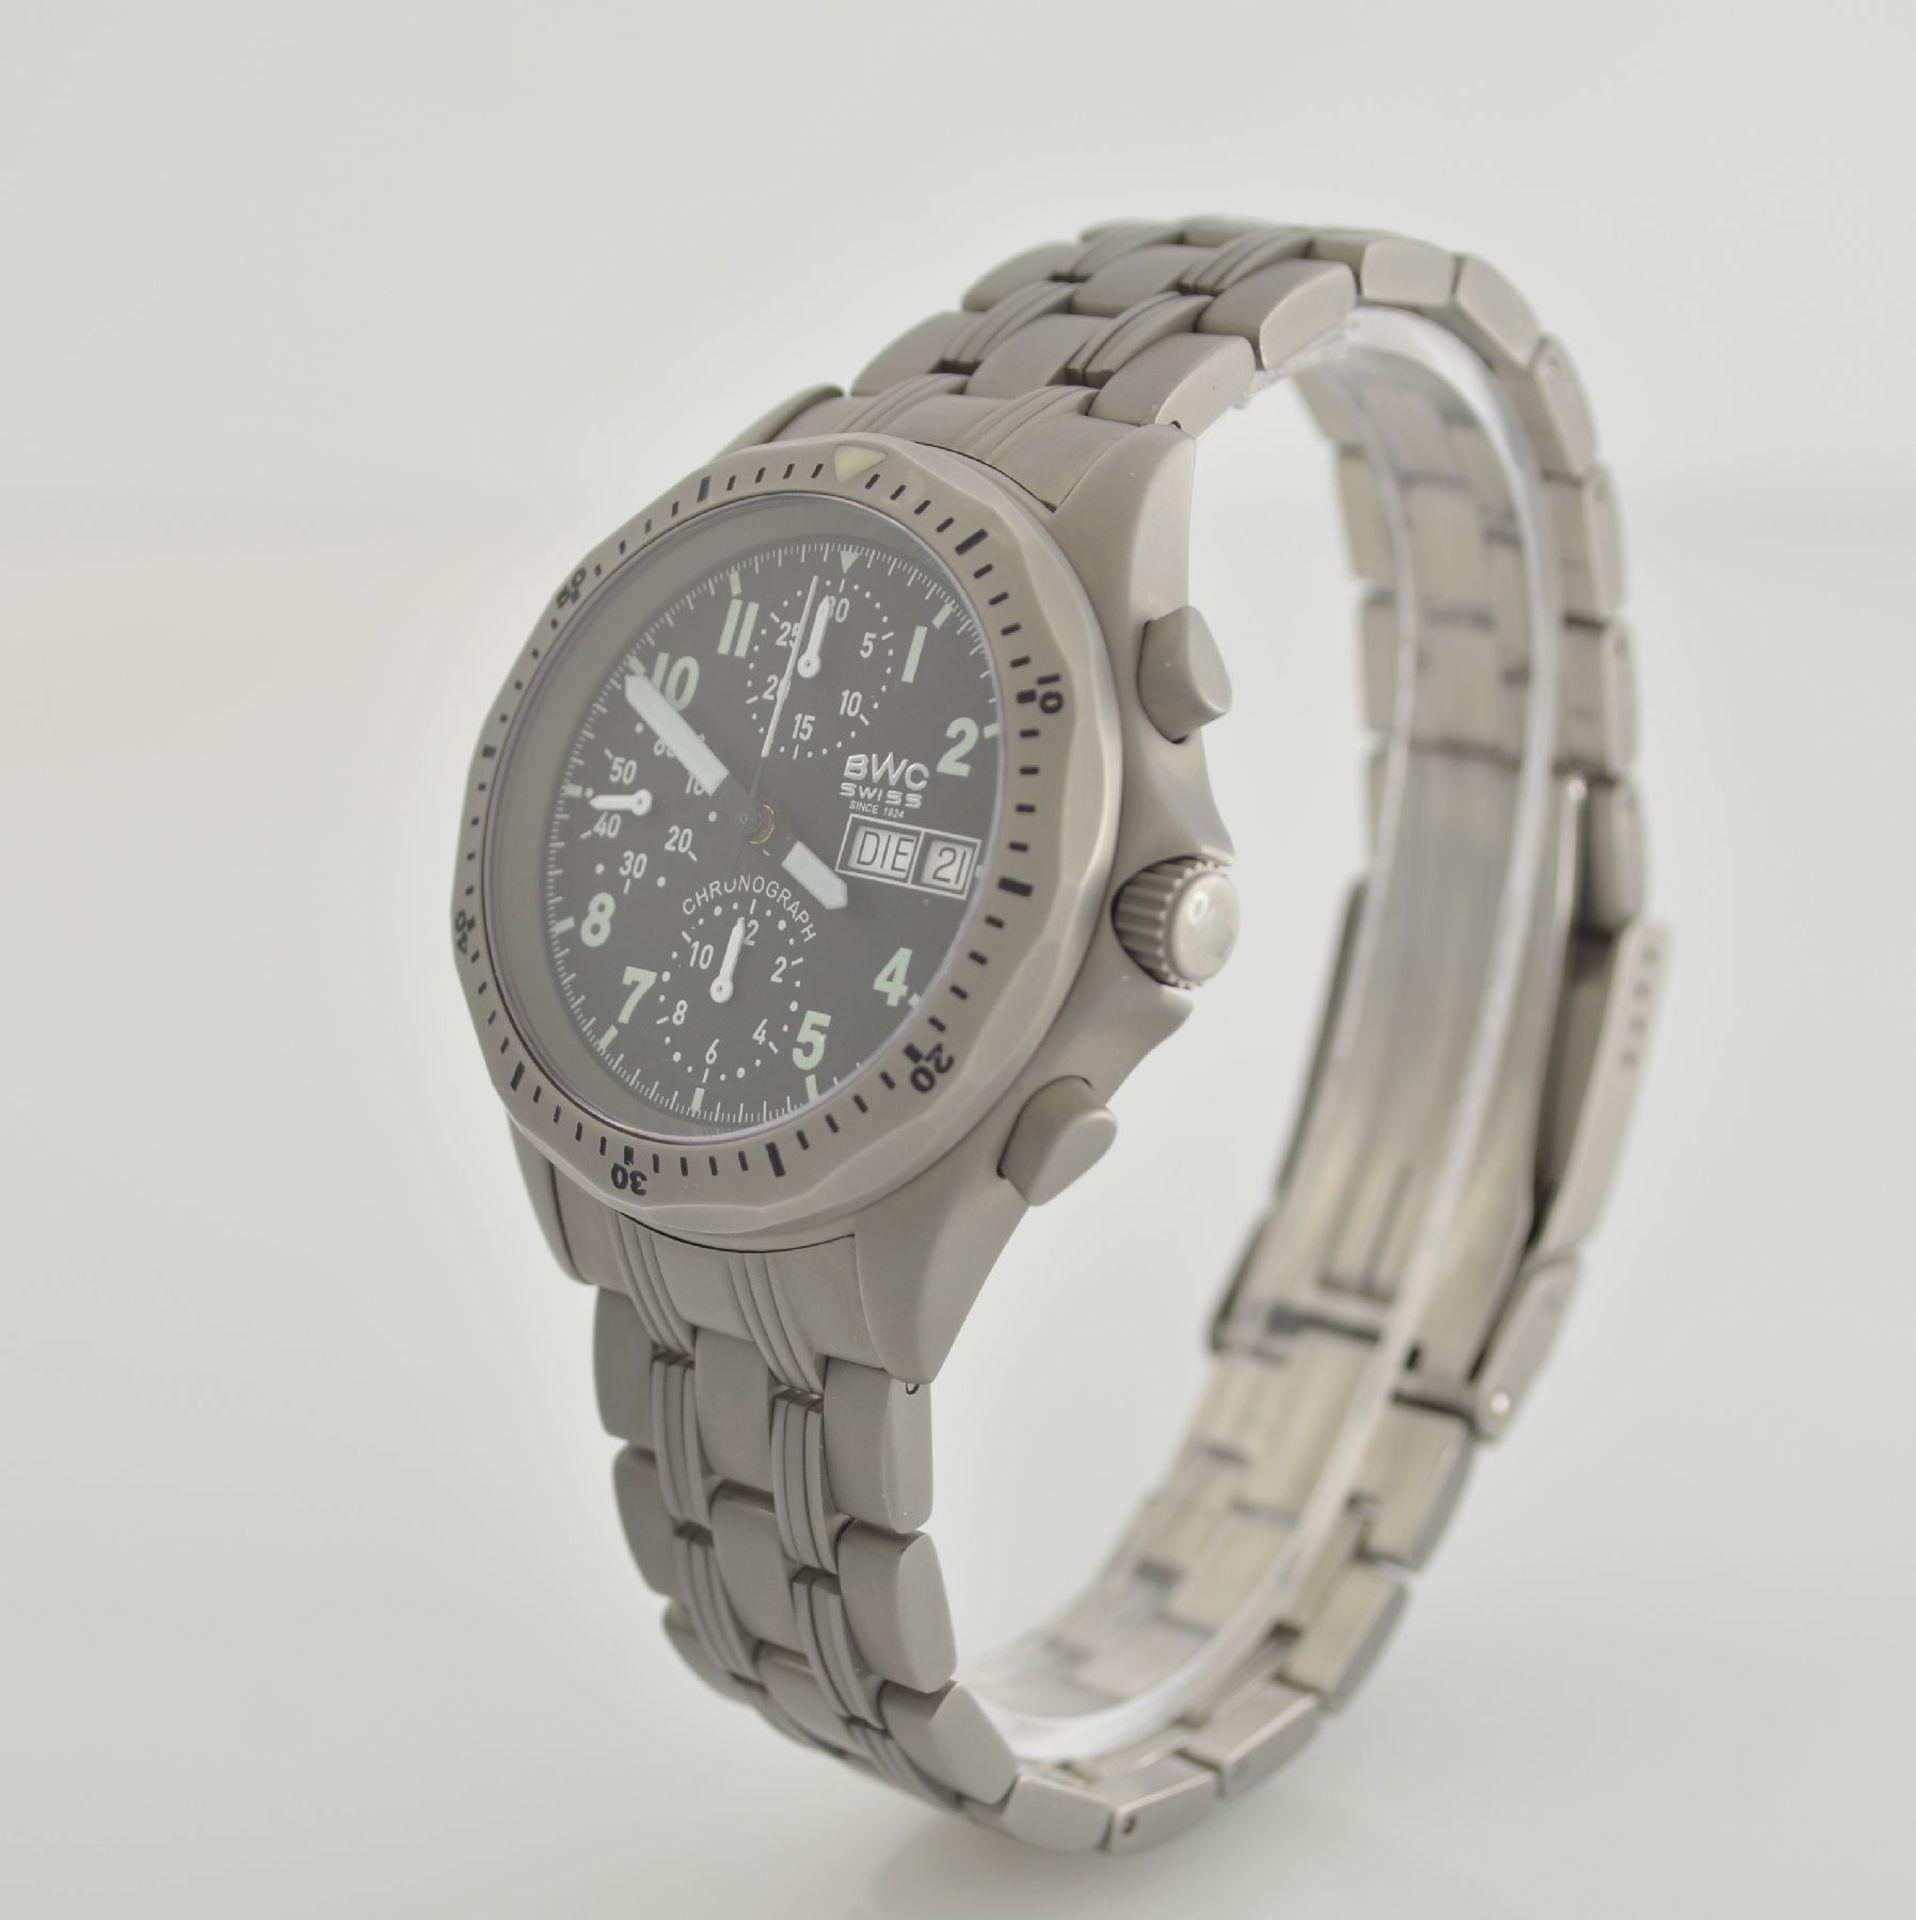 BWC Armbandchronograph, Automatik, Schweiz um 2010, matt. Edelstahlgeh. inkl. orig. Gliederband m. - Bild 3 aus 7